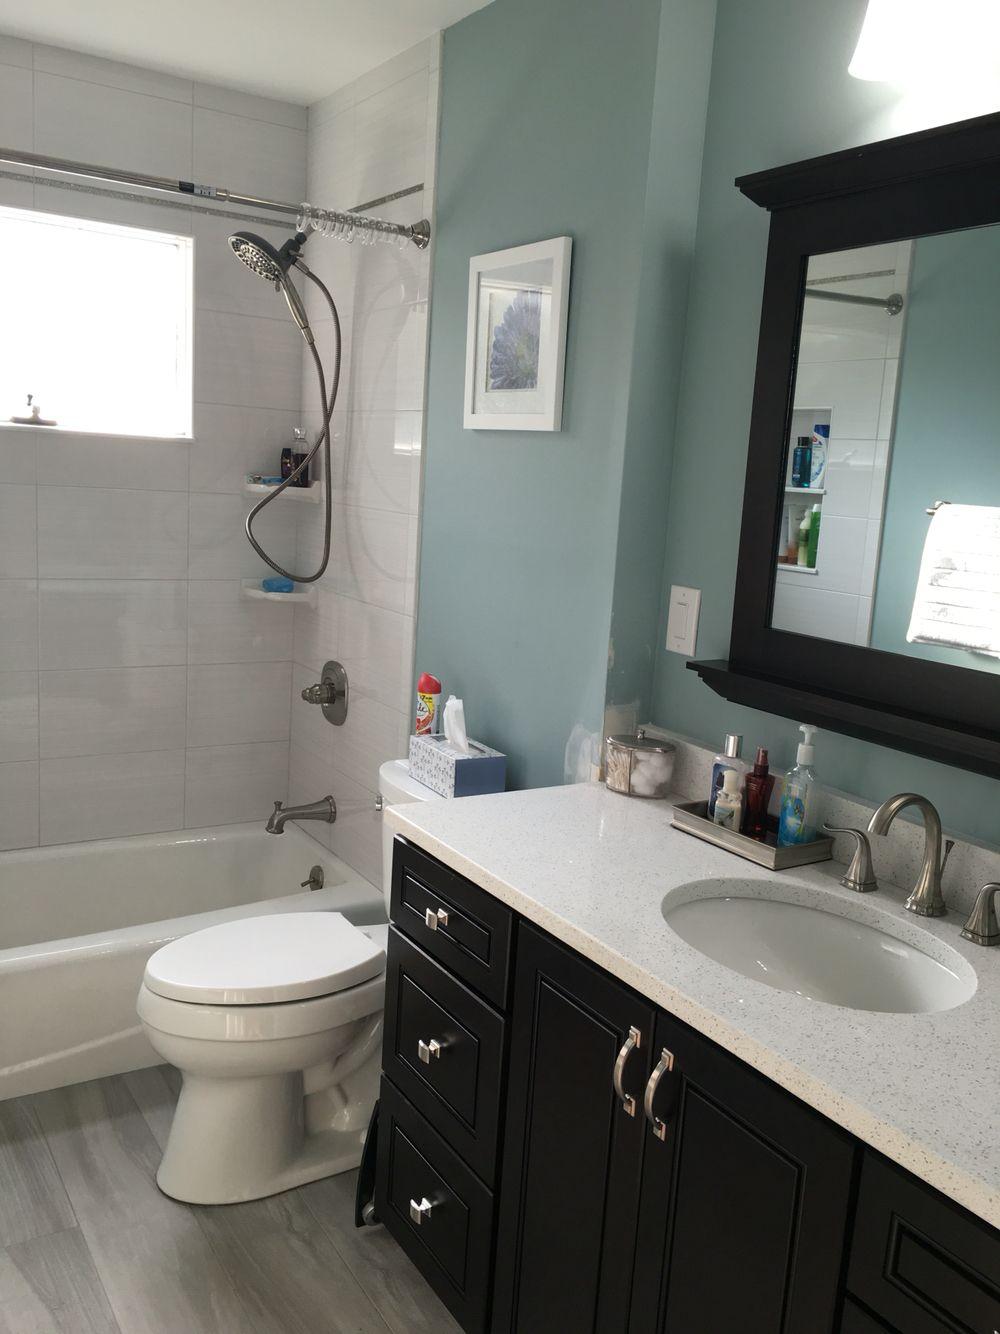 Our New Bathroom Bm Wedgewood Grey Paint Wood Tile Floor Espresso Vanity